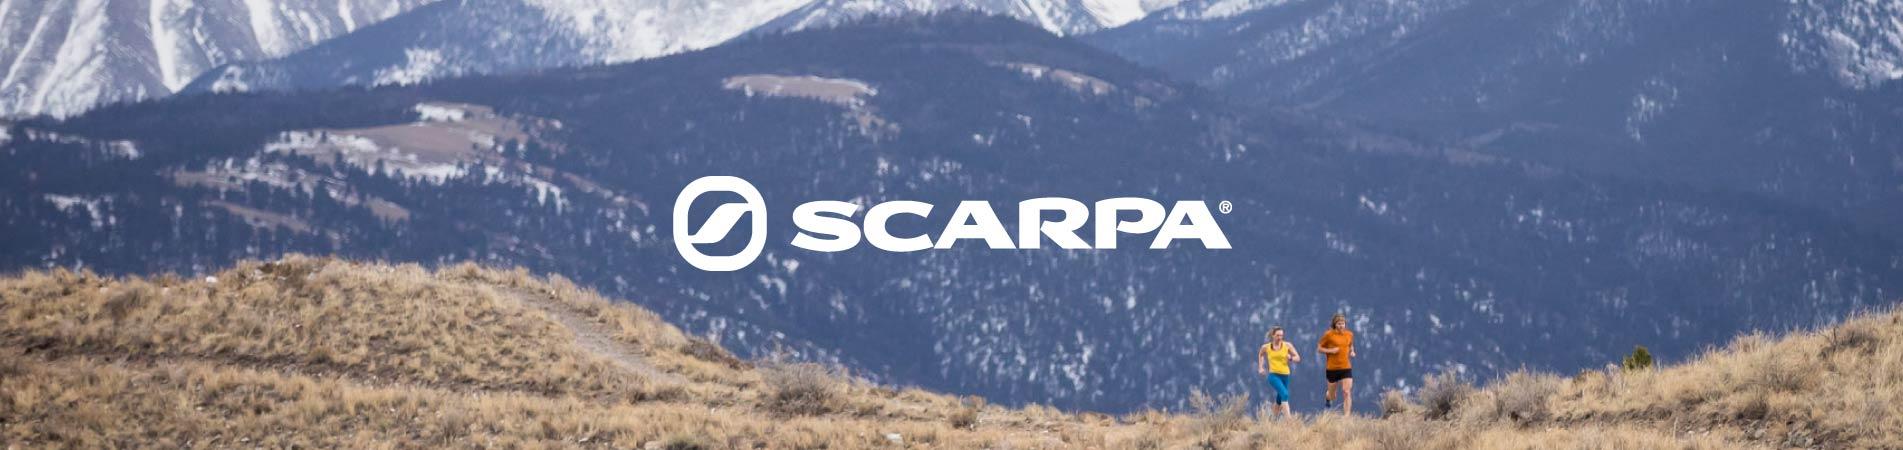 scarpa-brand-banner-v1r3.jpg